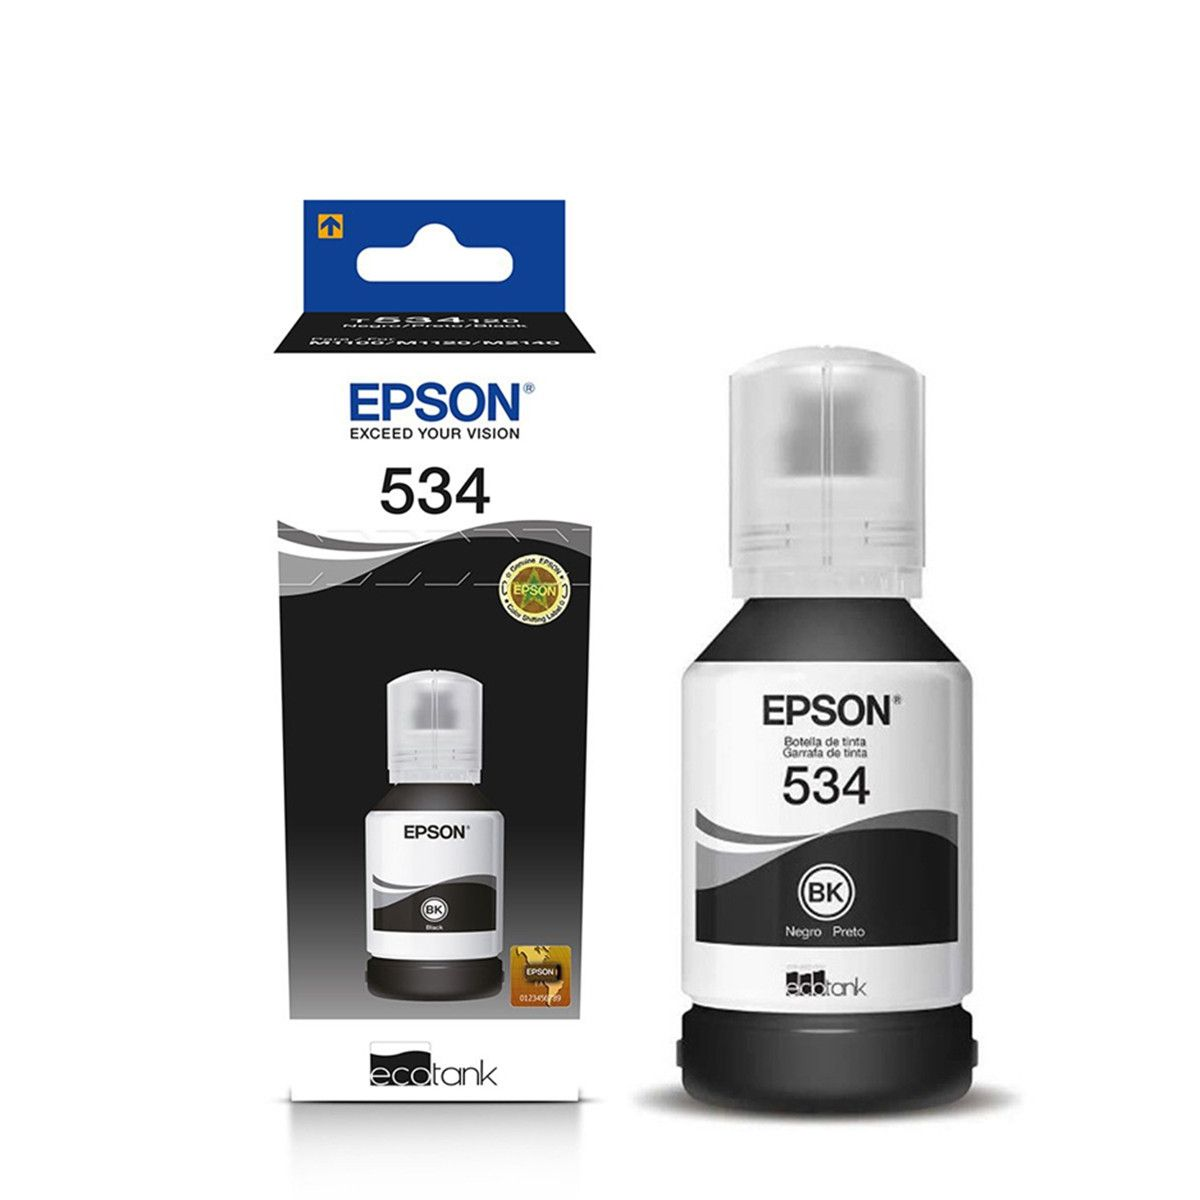 TINTA EPSON T534120 PRETO   M1120 M3180 M2170 M1180 M-3180 M-1120 M-2170 M-1180   ORIGINAL 120ML